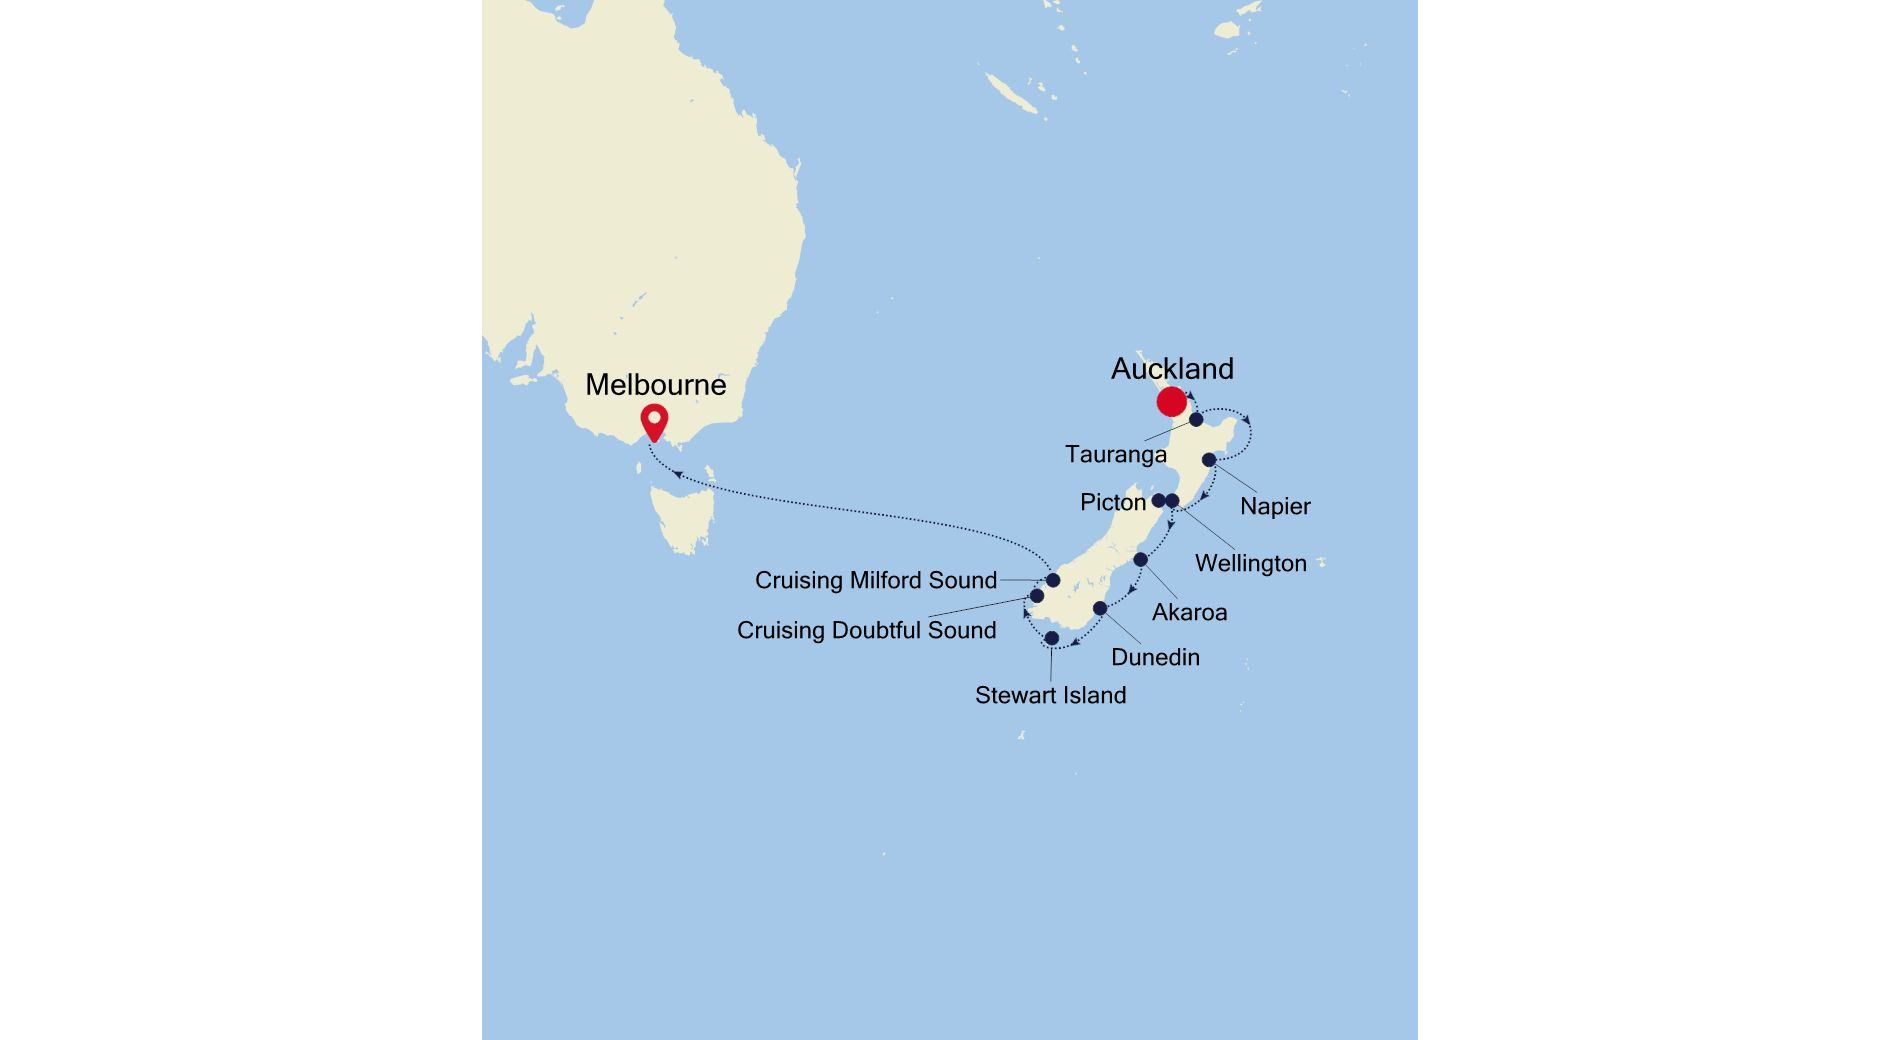 SS220320S13 - Auckland nach Melbourne